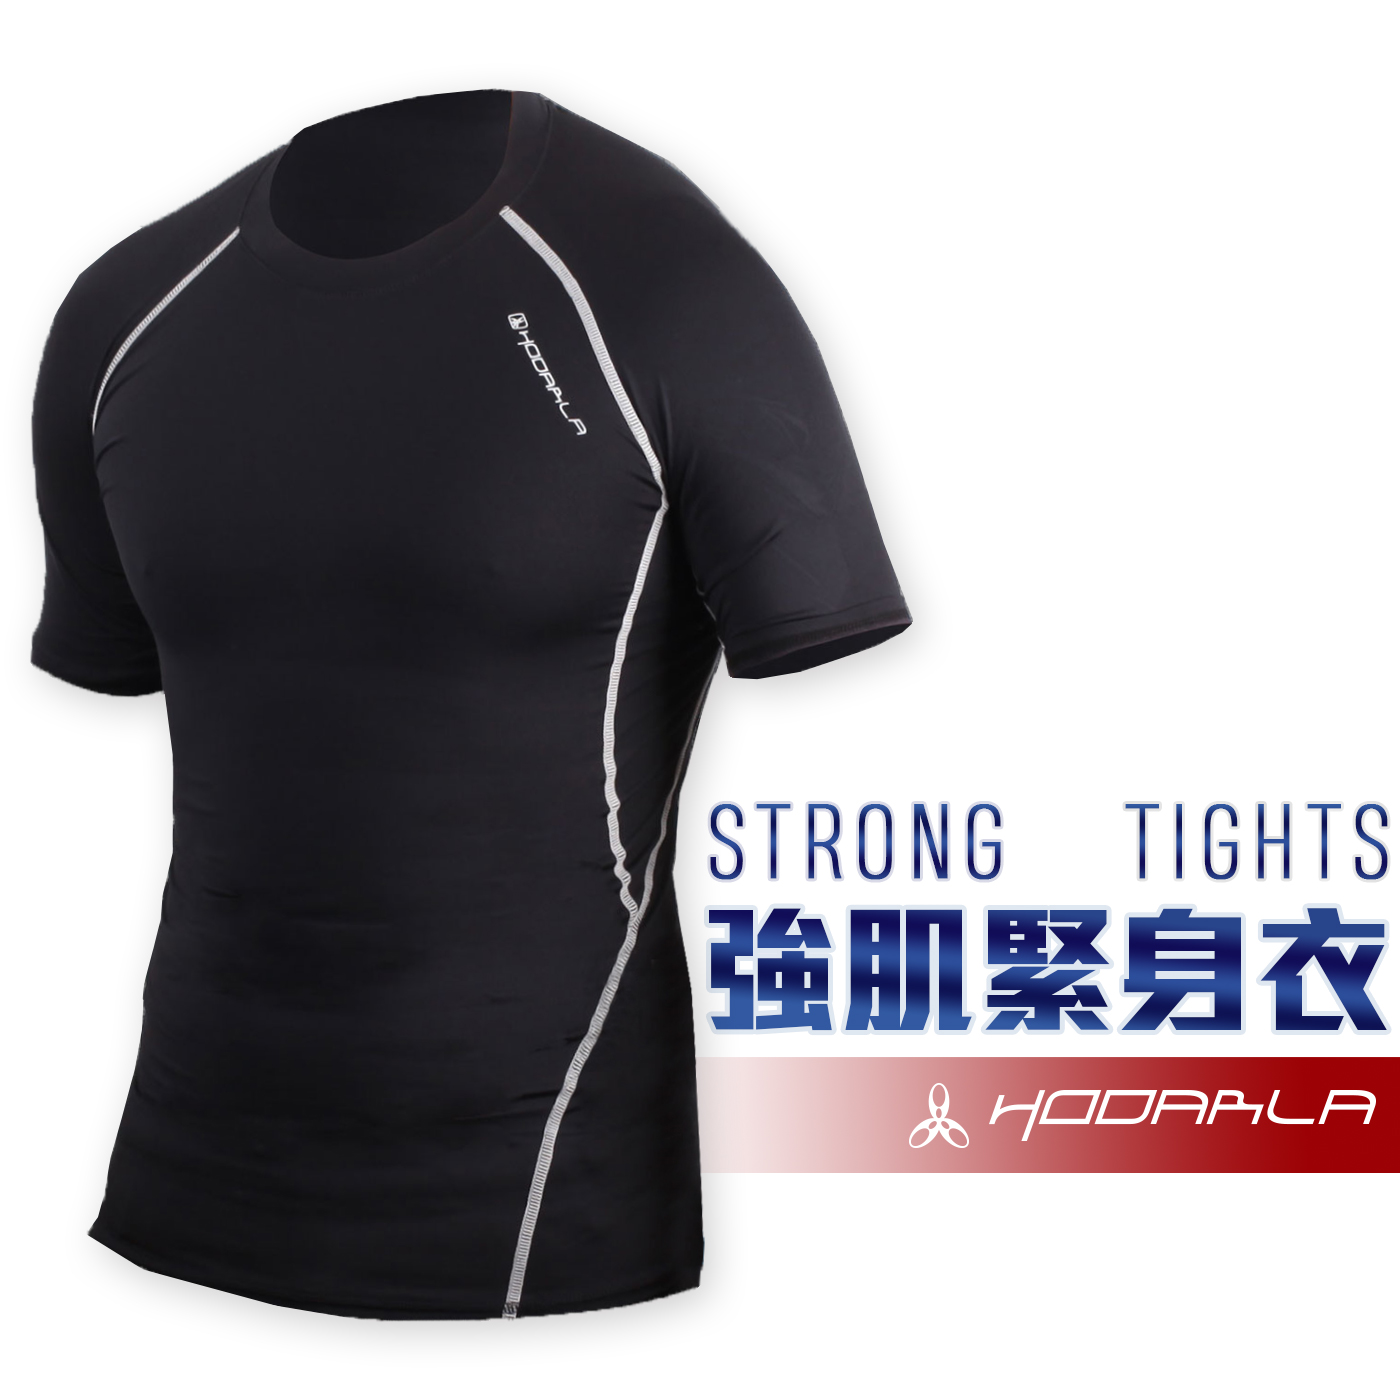 HODARLA 男肌動圓領短袖緊身衣-台灣製 T恤 短T 籃球 慢跑健身 黑灰@3115501@